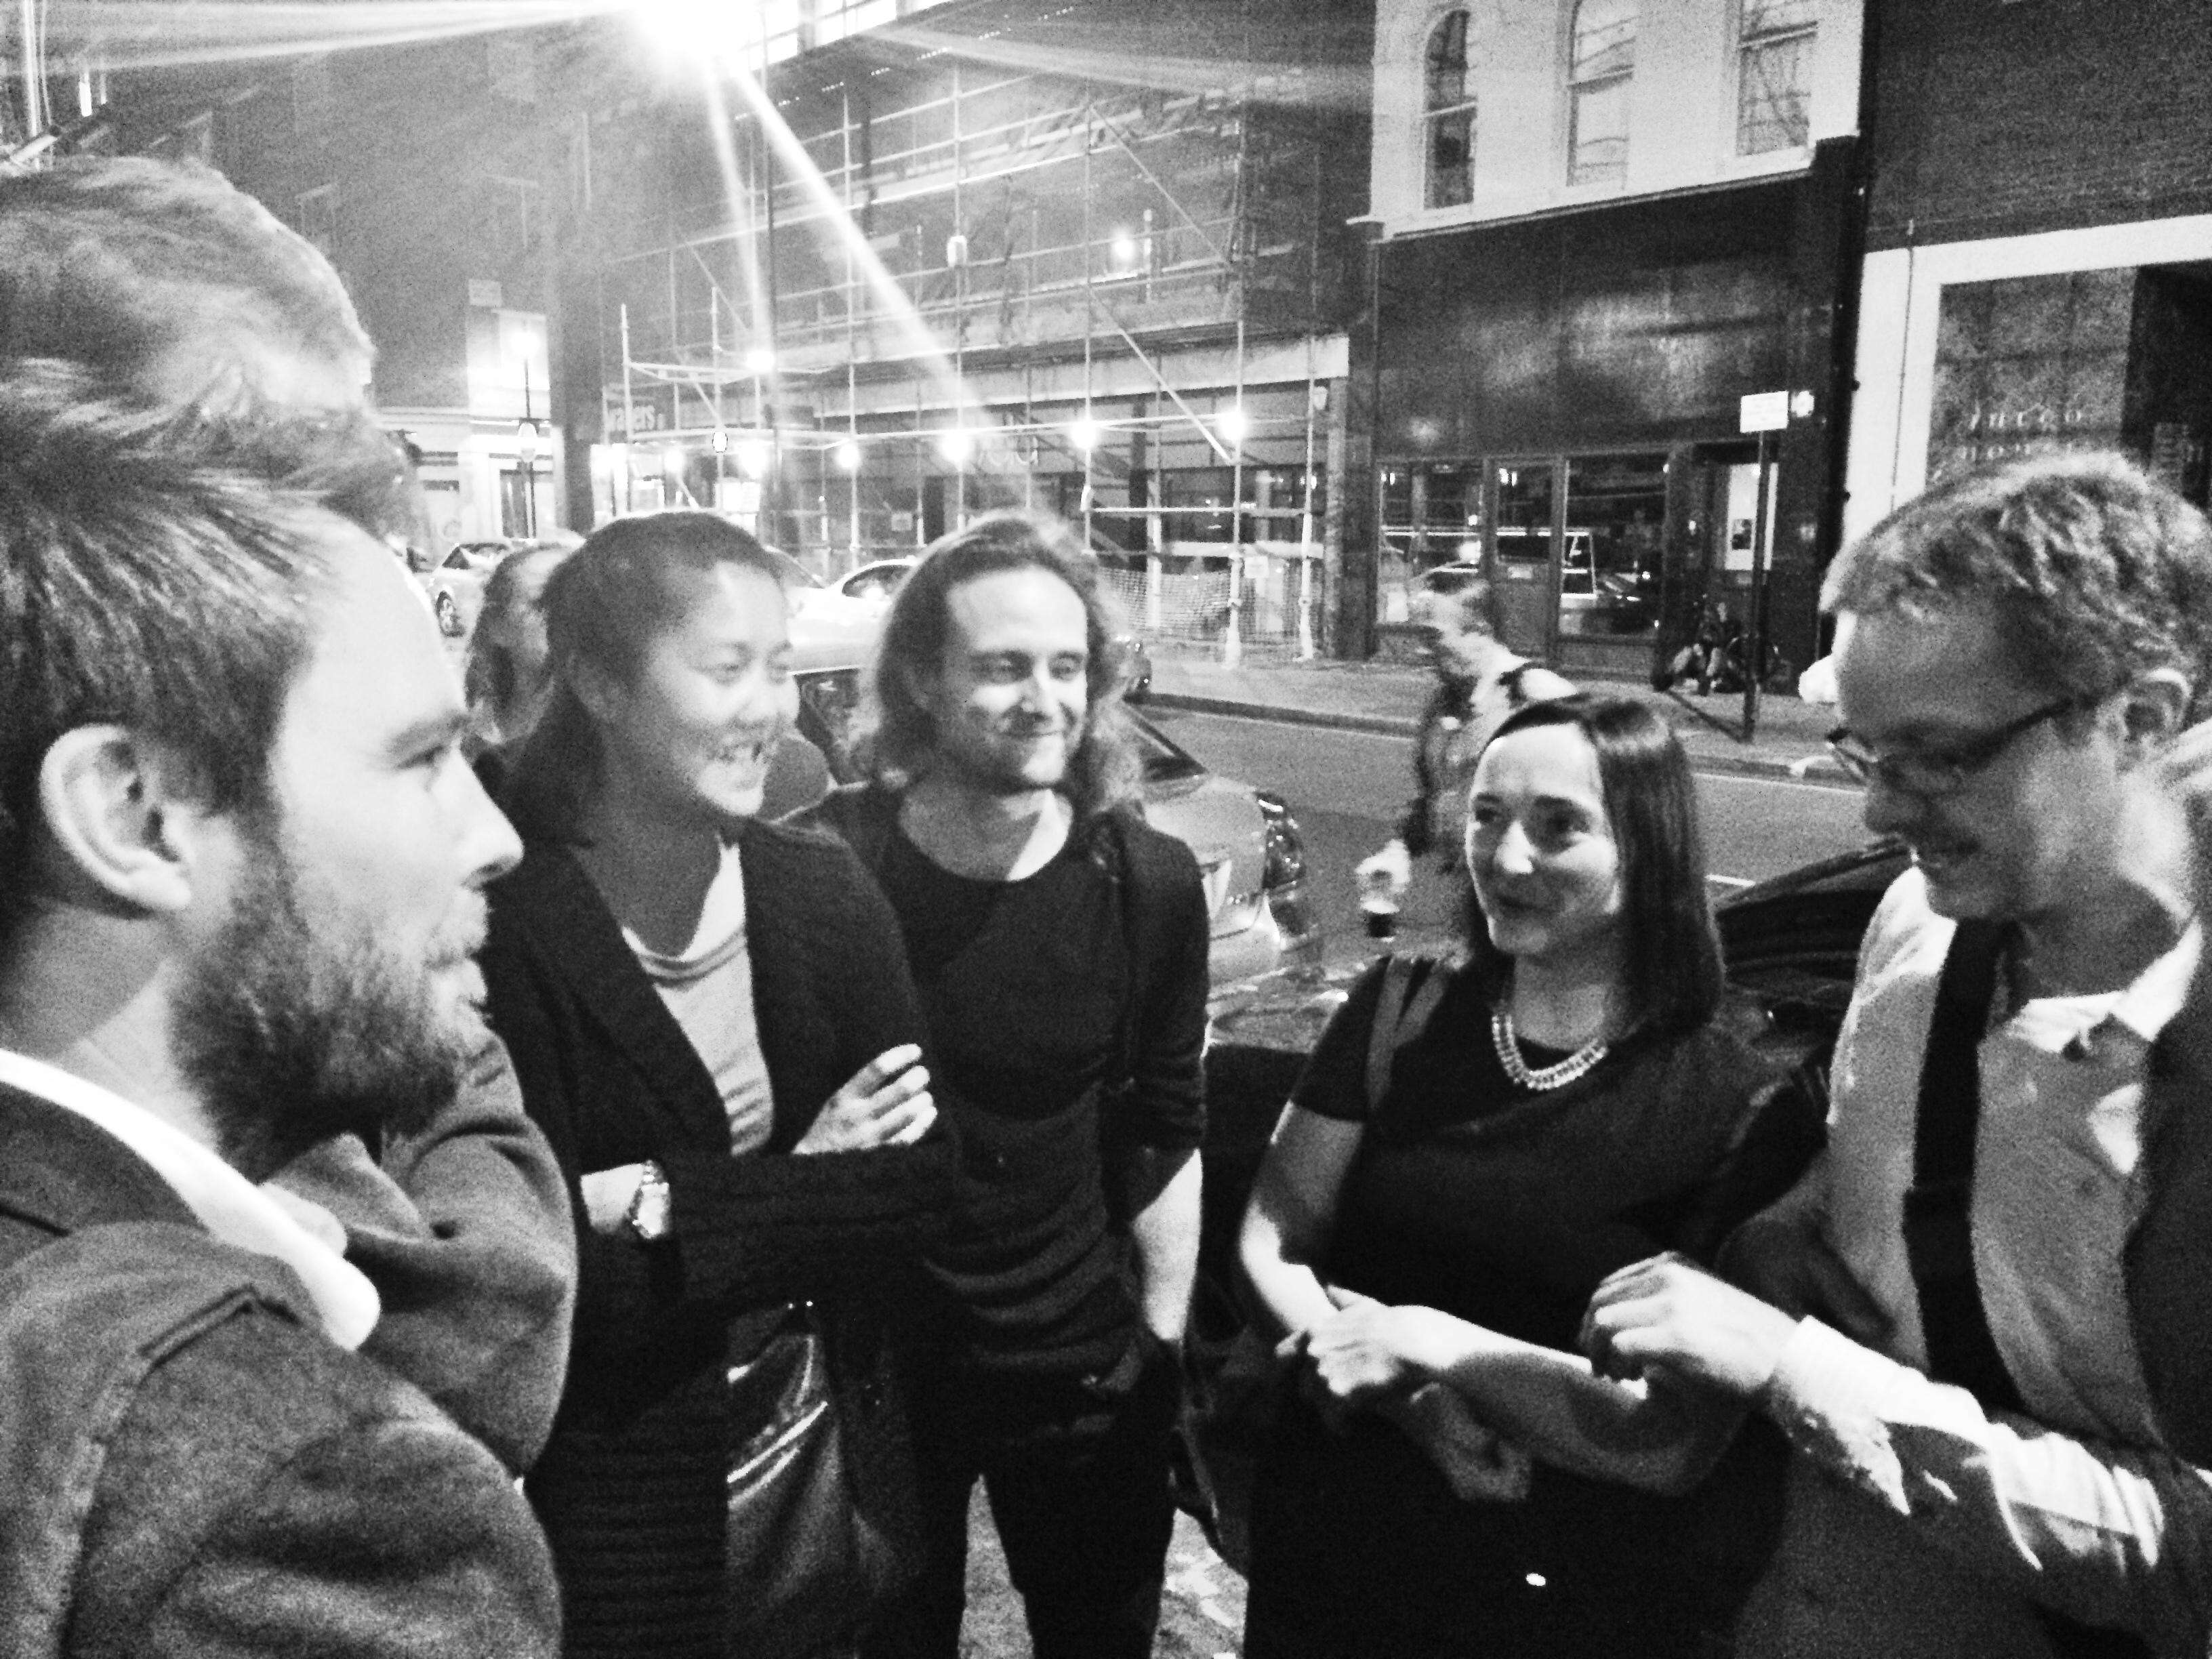 Rhys Pritchard, Candice Lo, Peter Harvey, Becky Palmer